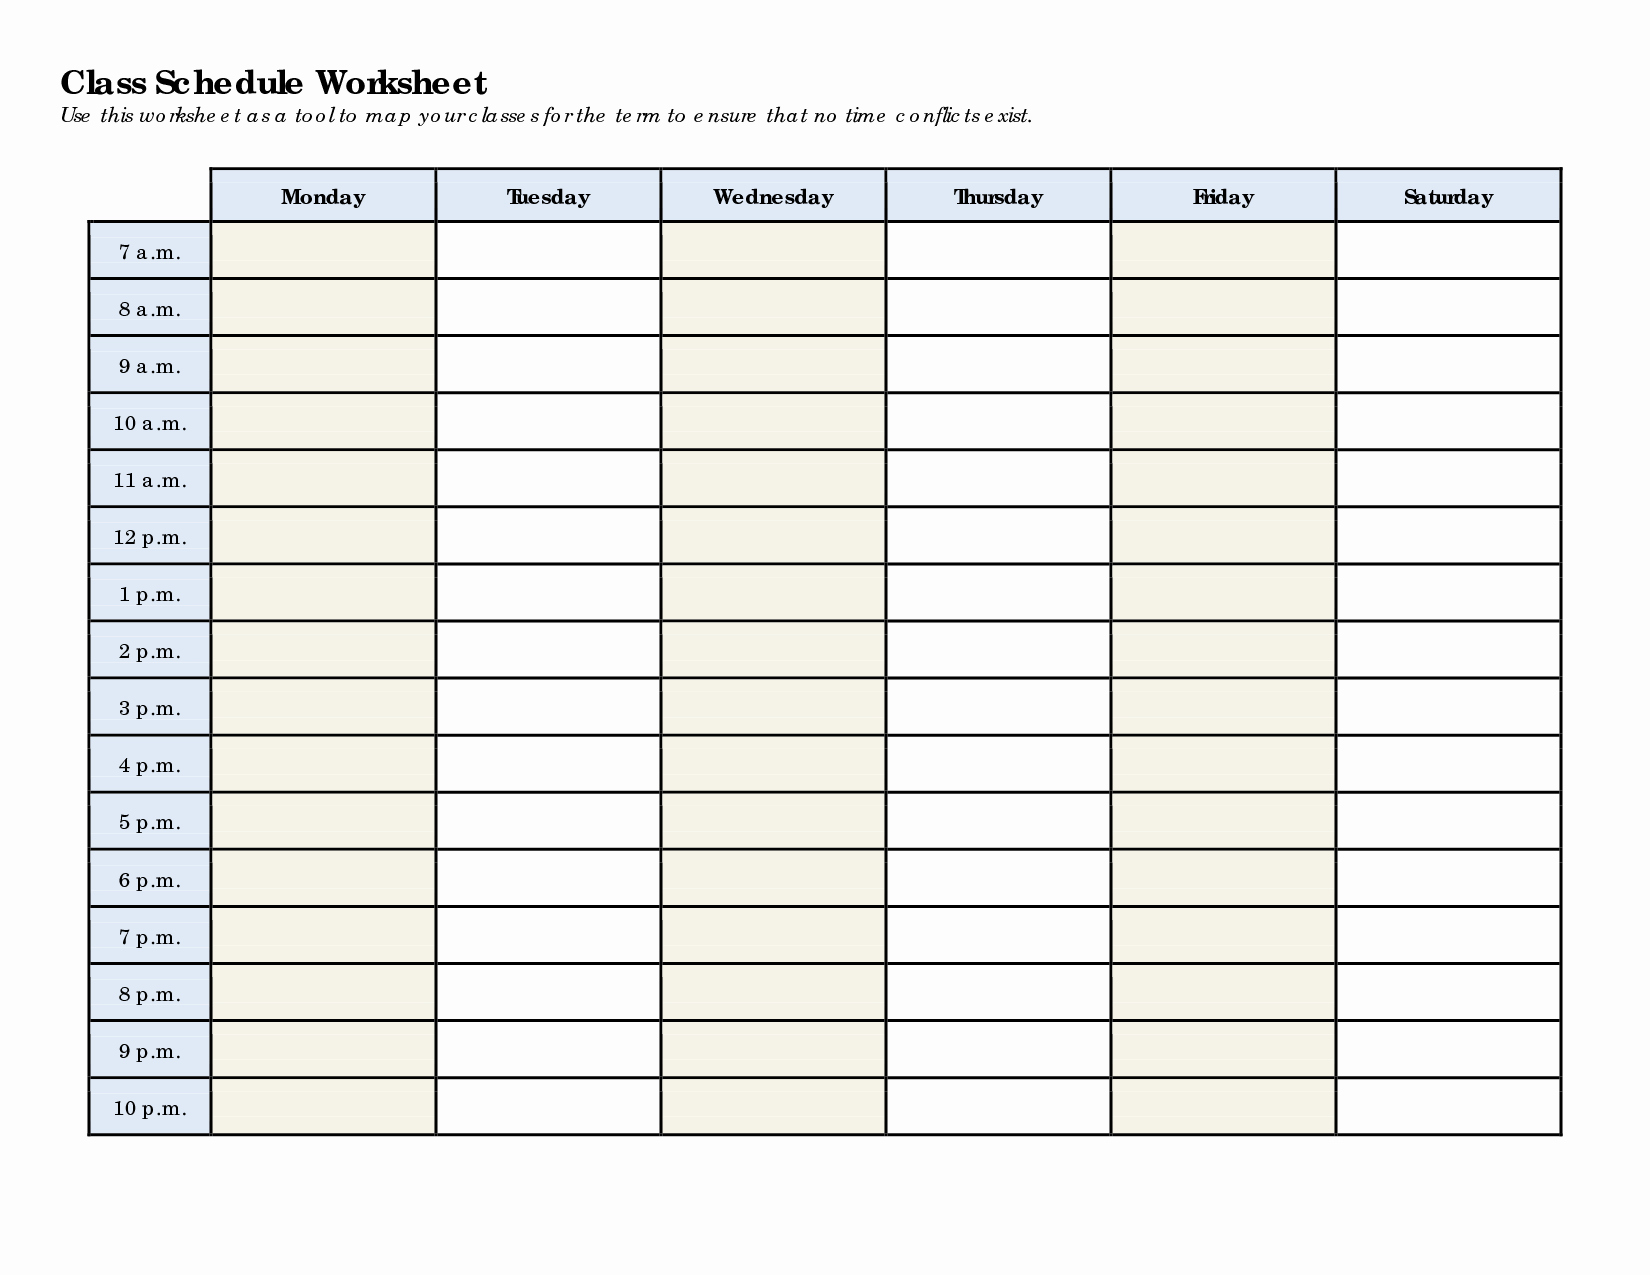 Weekly College Schedule Template Fresh Schedule Worksheet Templates Homeschool